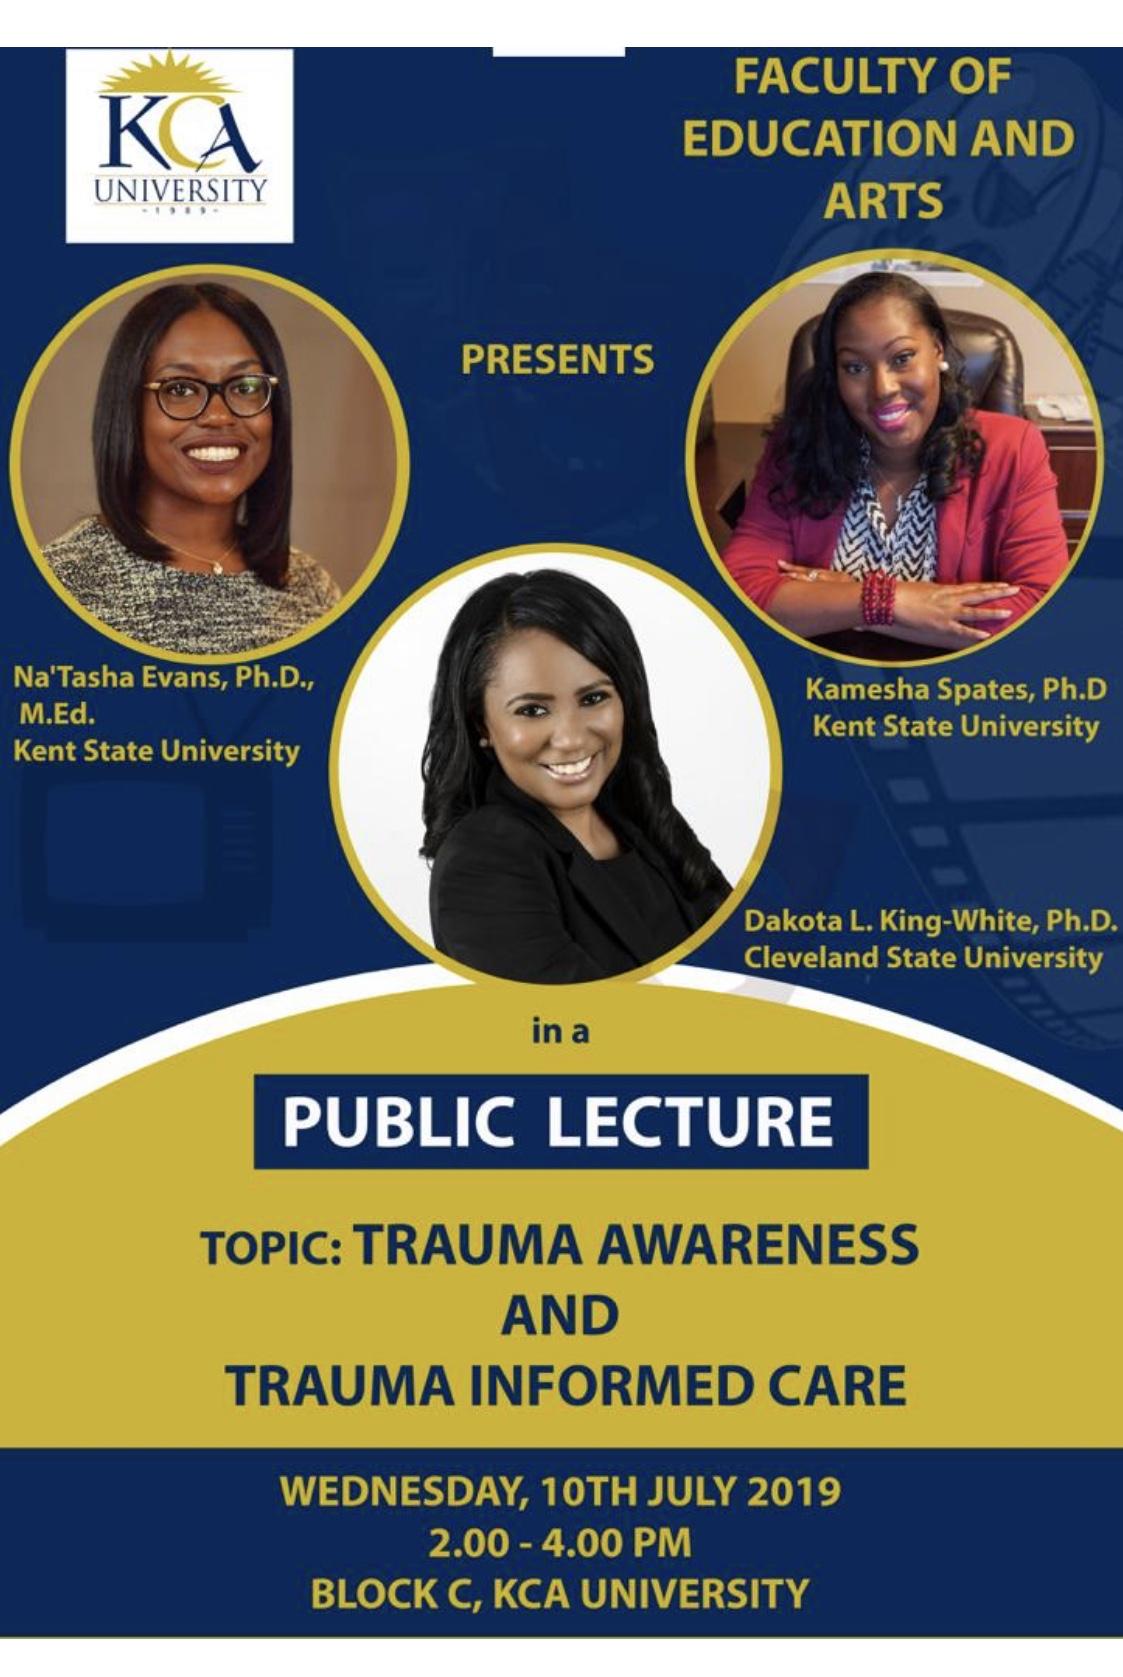 KCA University presentation flyer